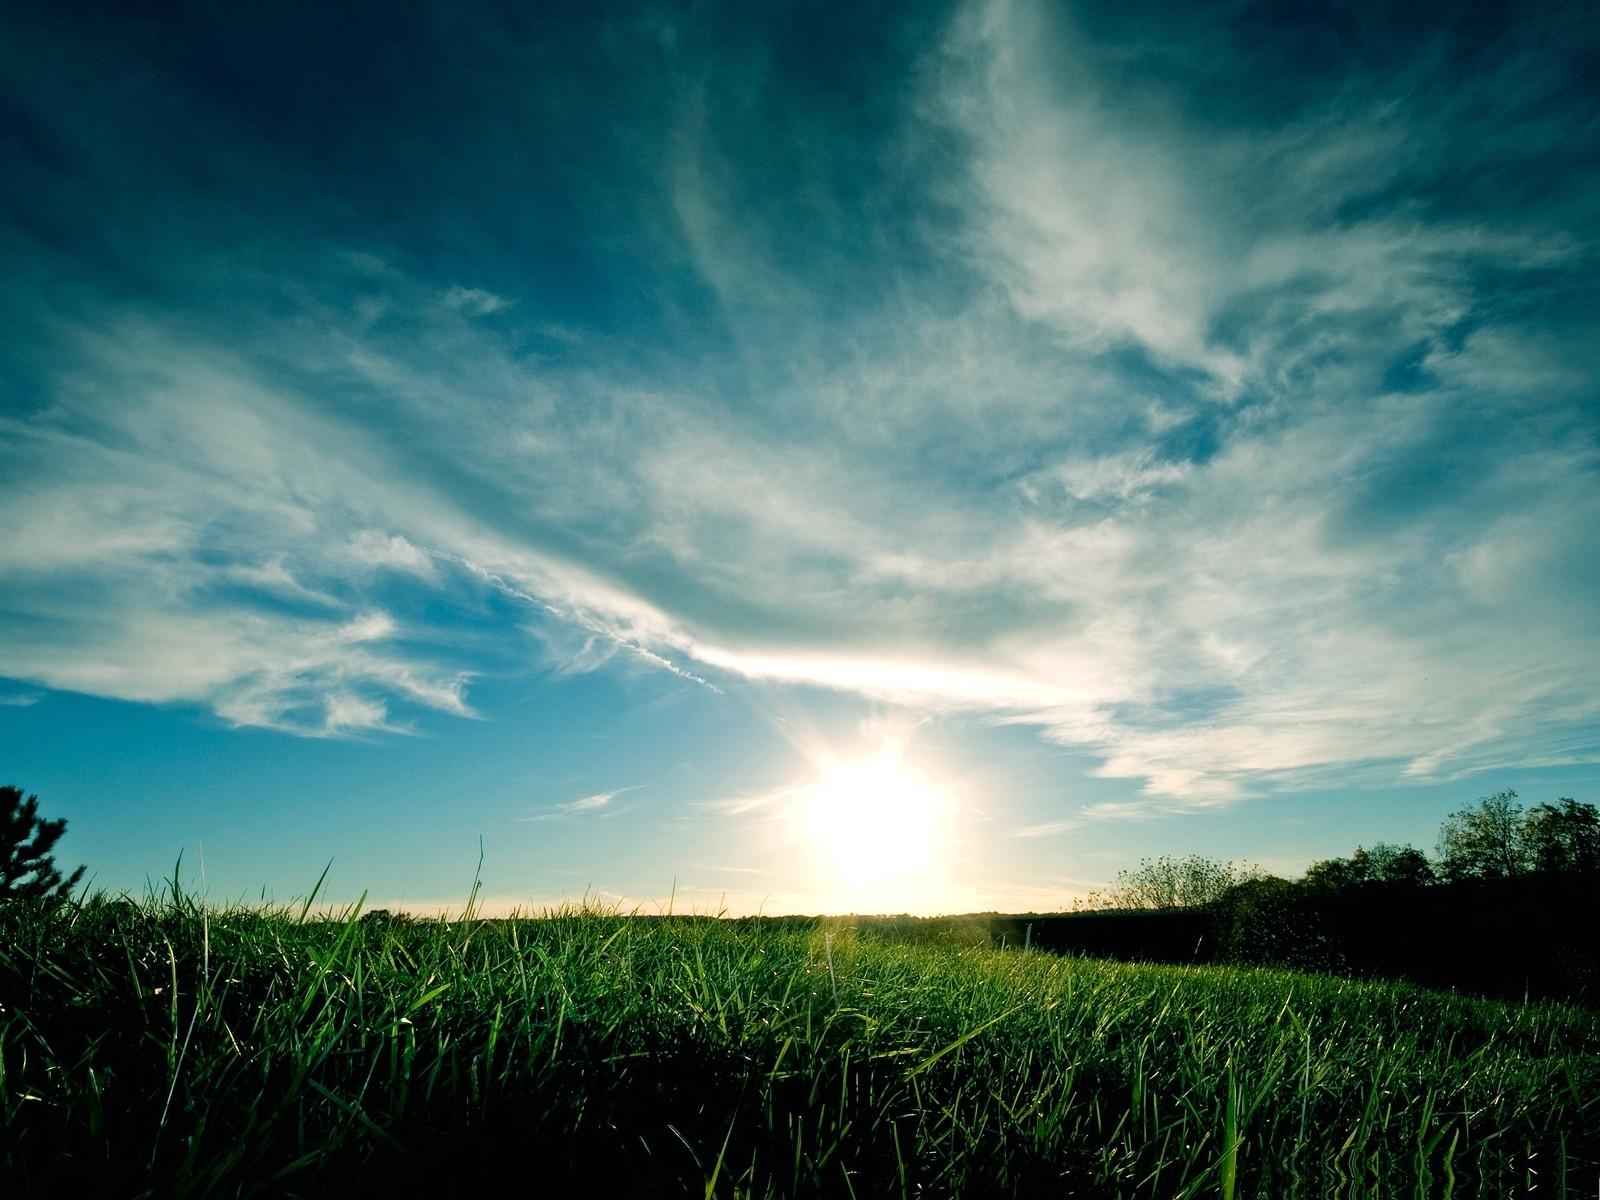 Earth Grass 1600x1200